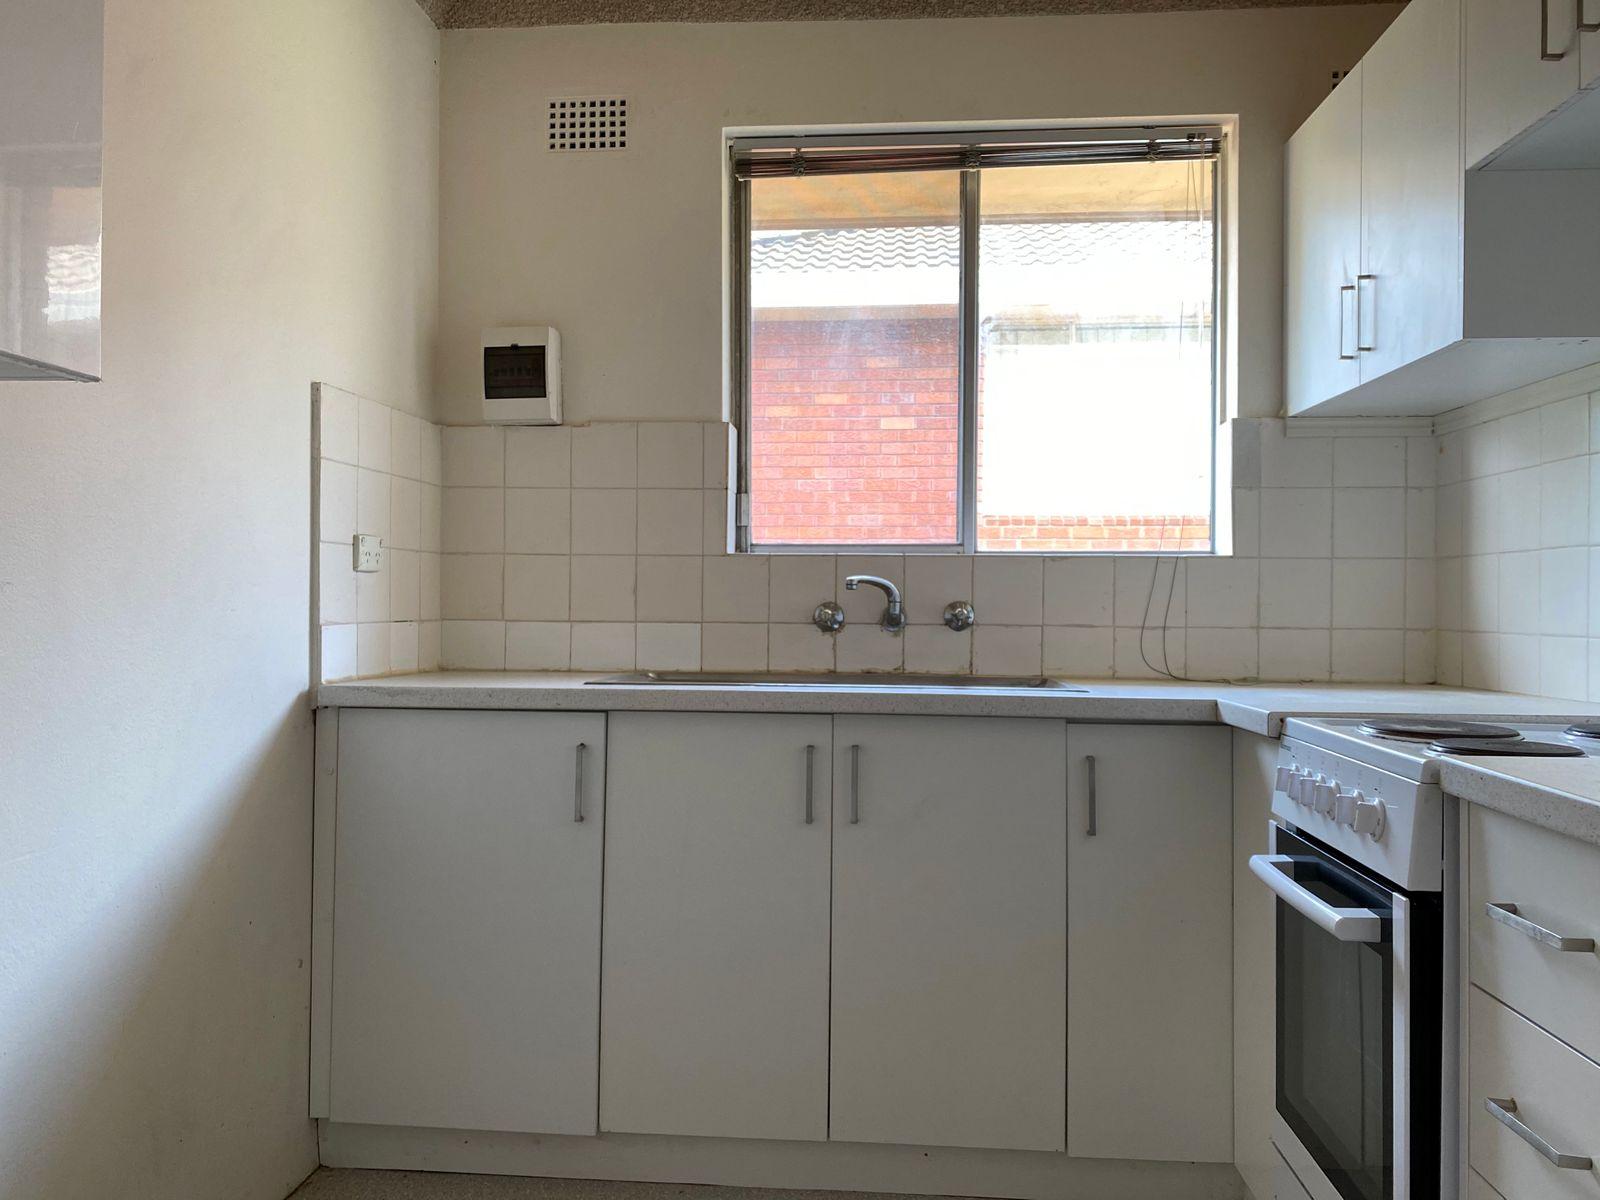 14/8-12 Kent Street, Newtown, NSW 2042